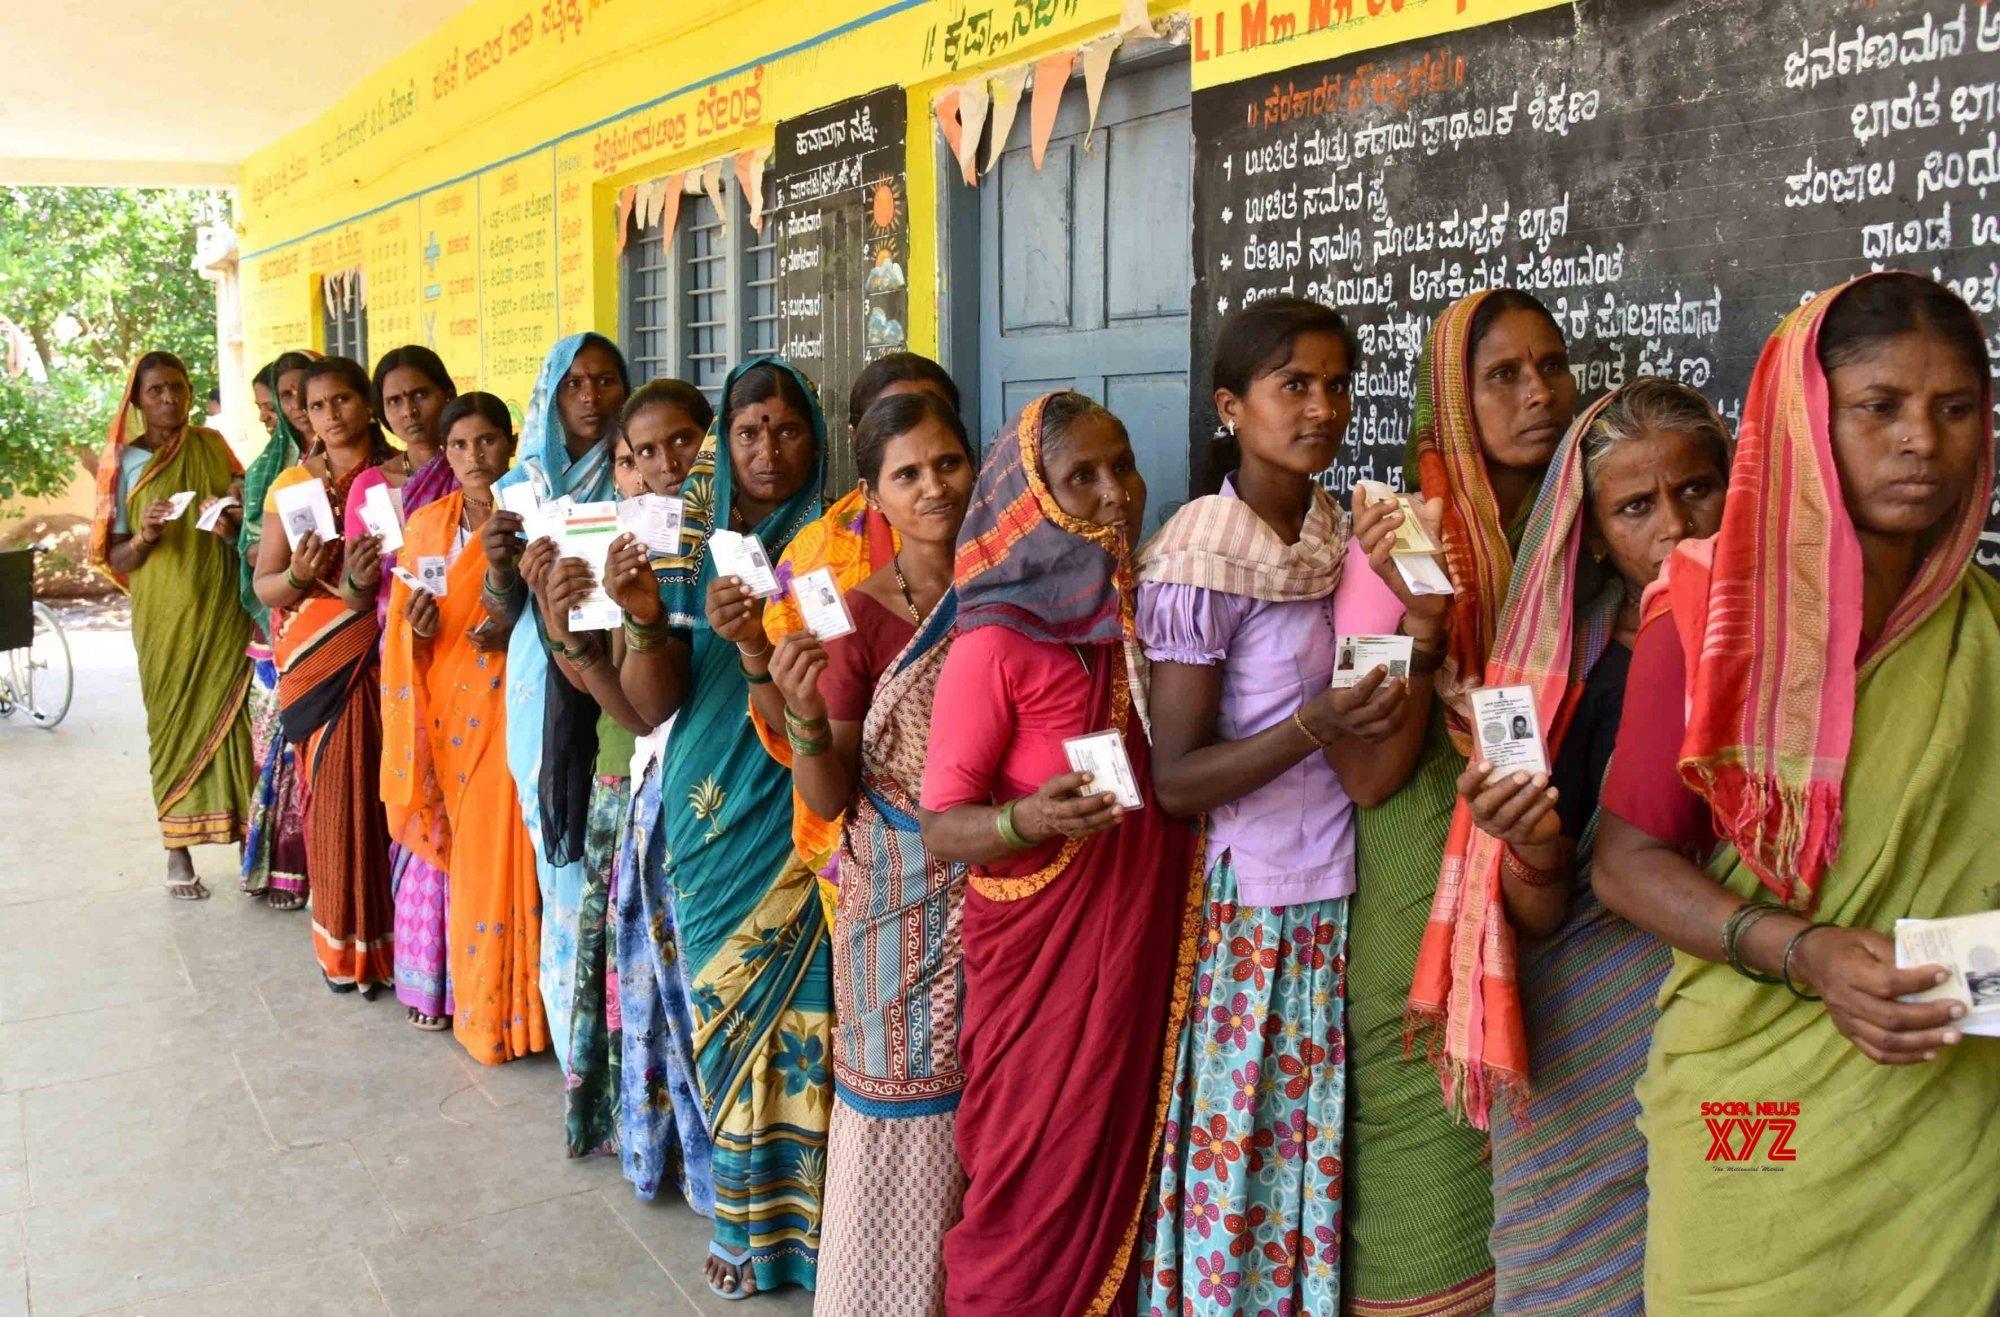 Karnataka bypolls: Rs 21 lakh seized in 24 hours